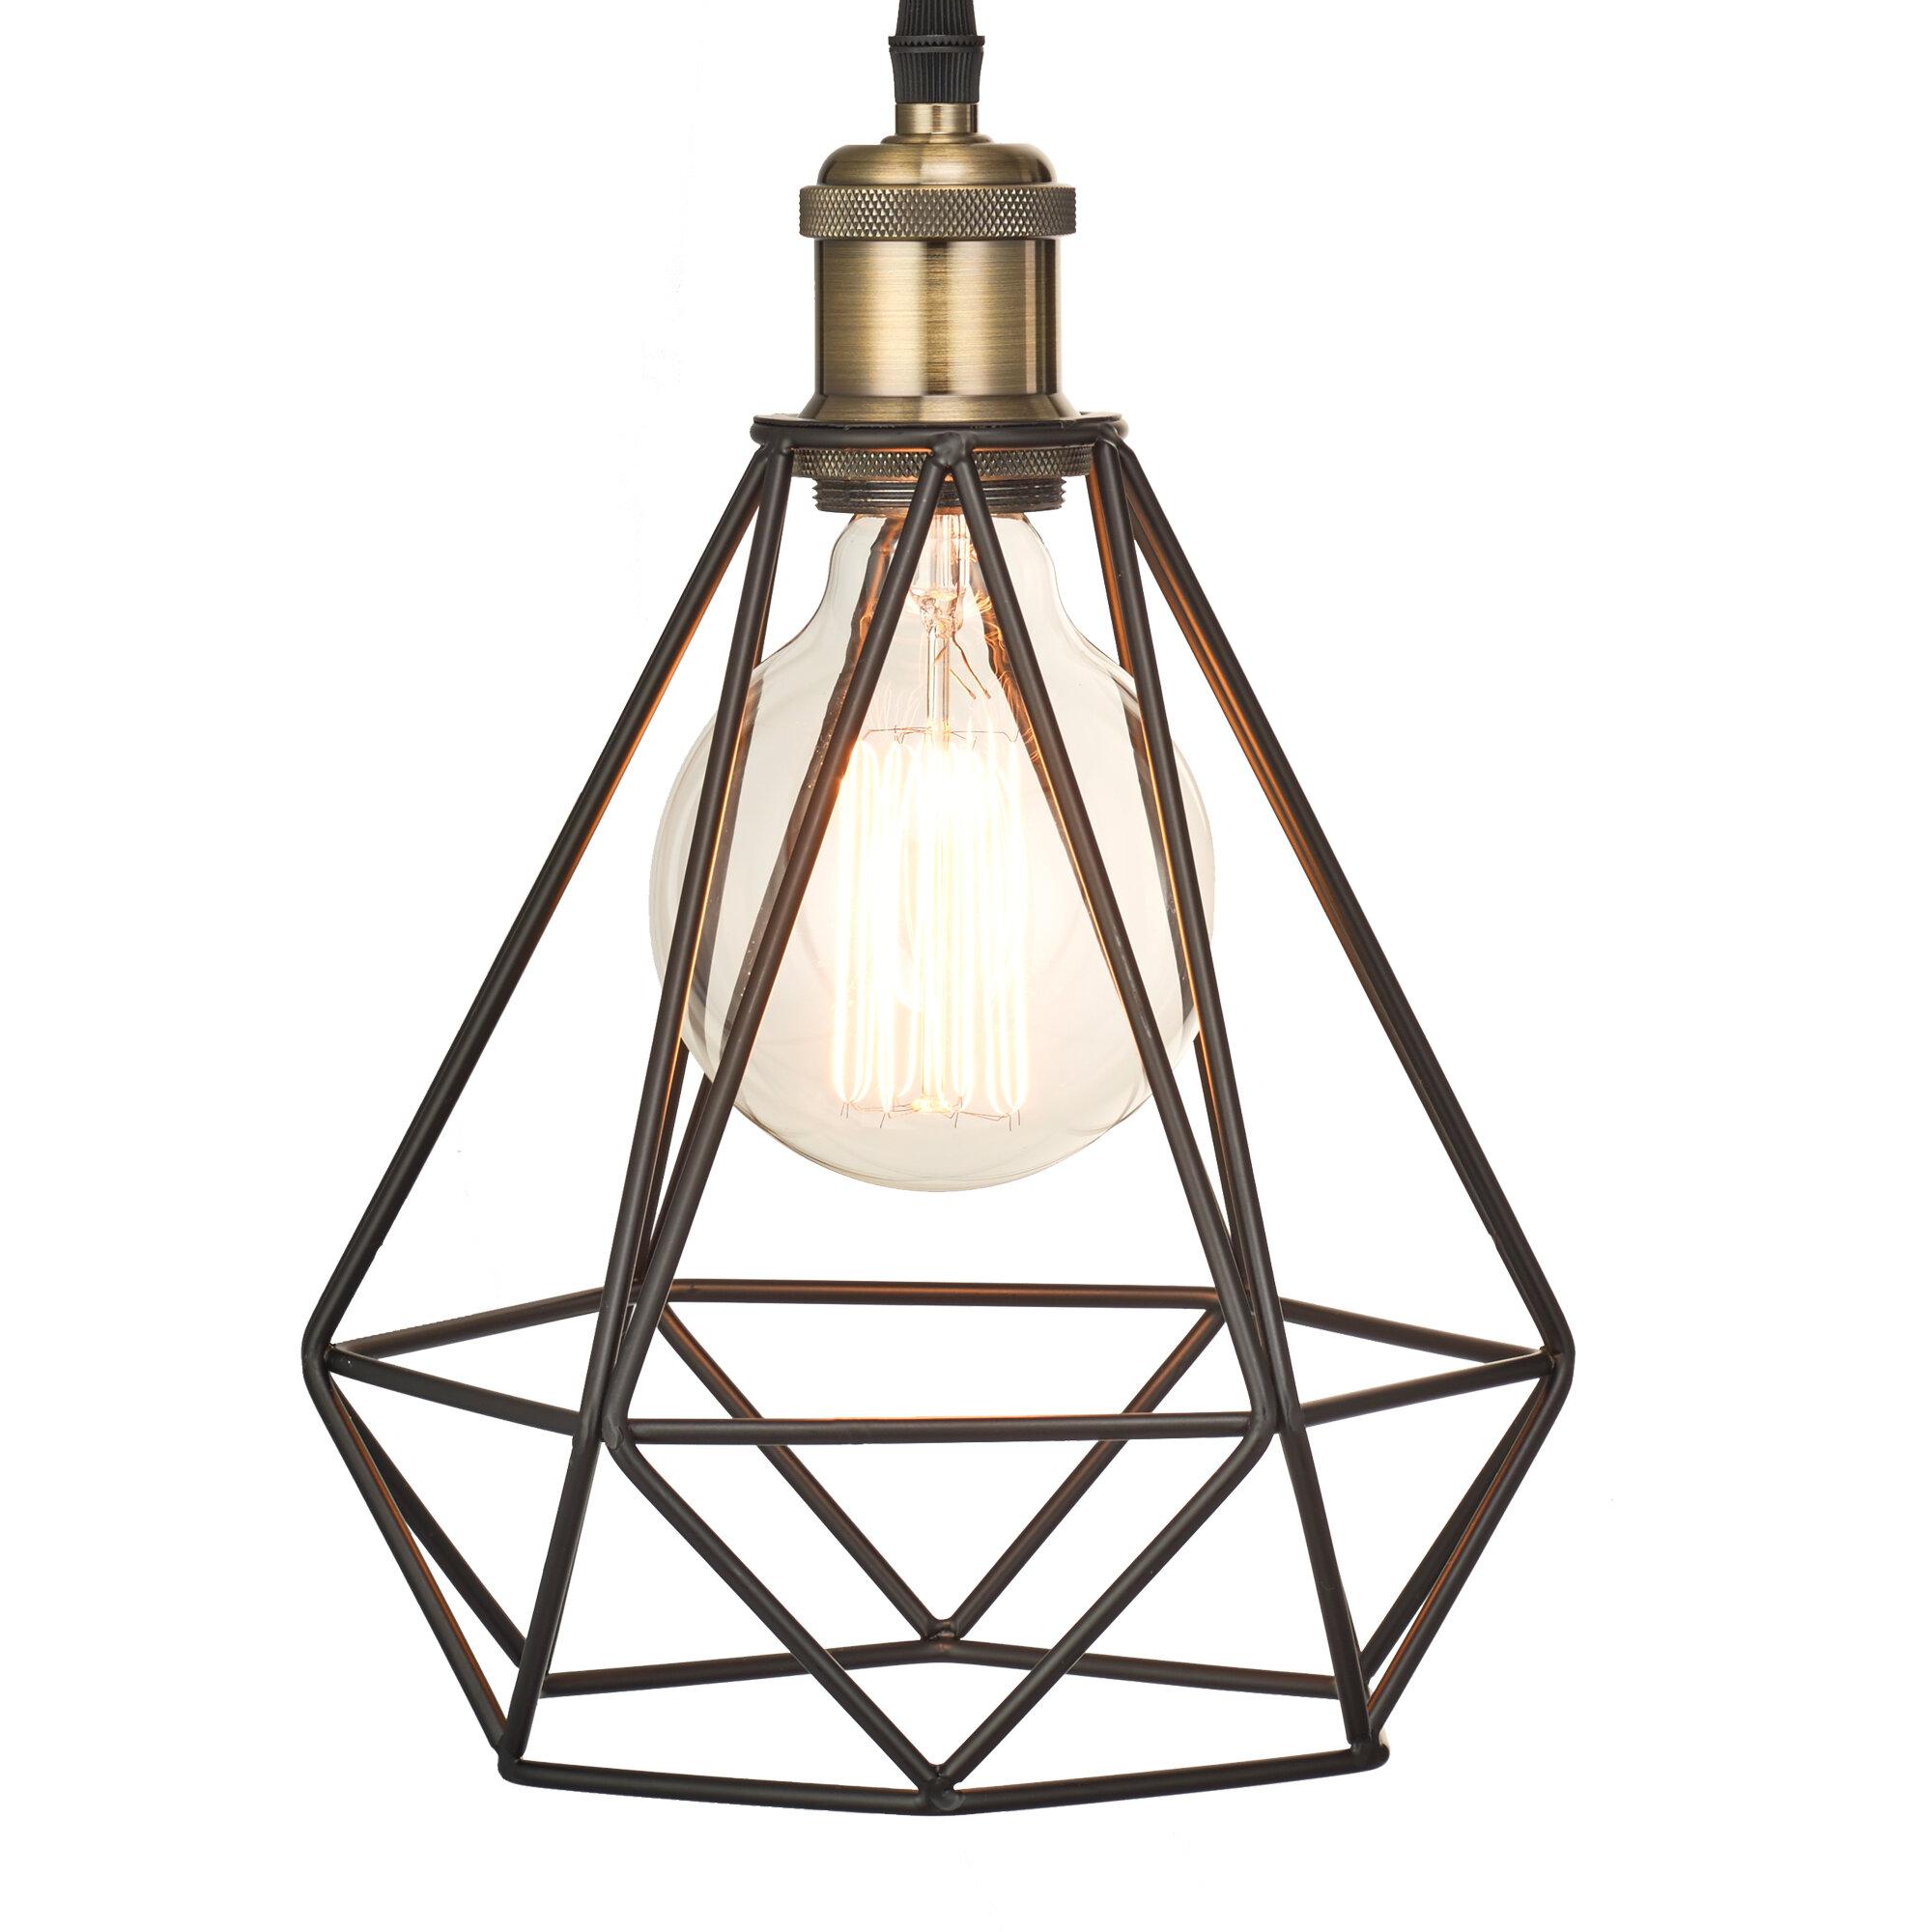 Brayden Studio Danial 1 Light Single Geometric Pendant Reviews Wayfair